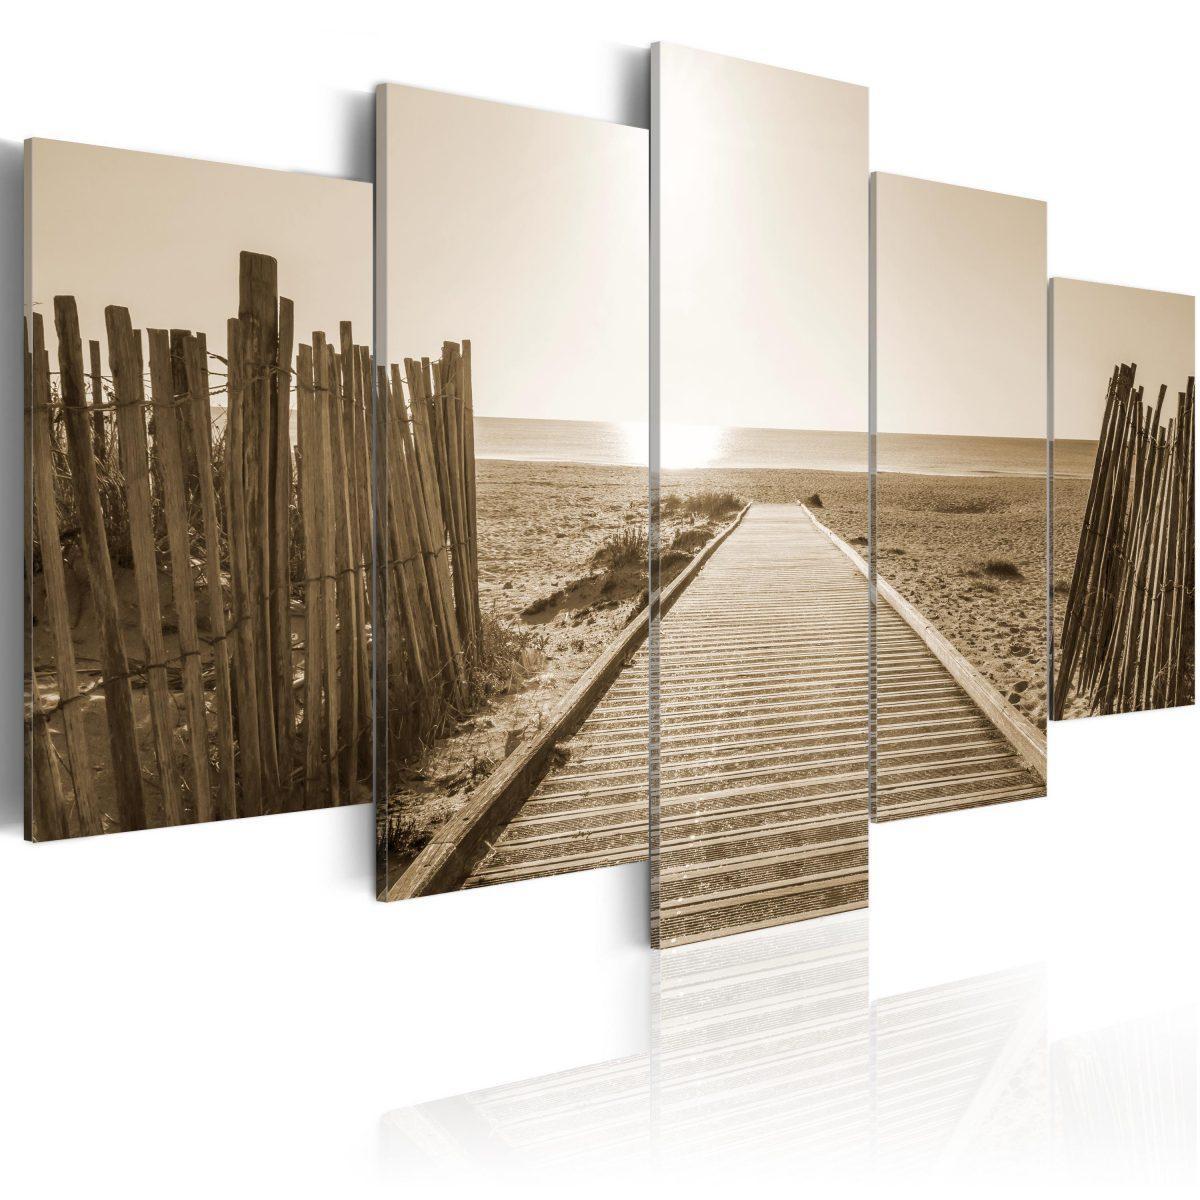 Canvas Tavla - Beach of Memories - 100x50